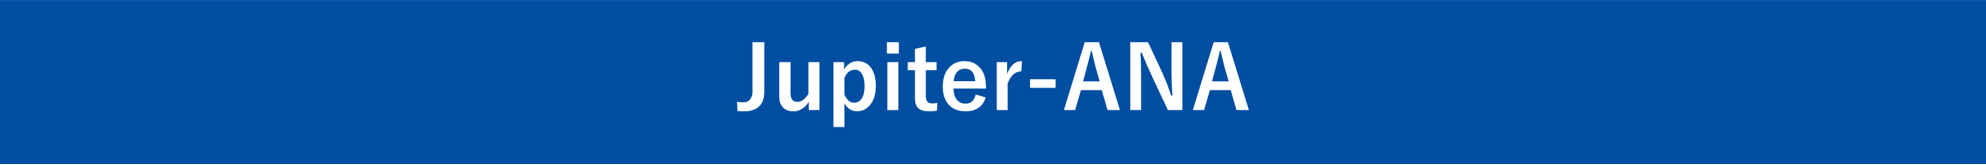 Jupiter-ANA